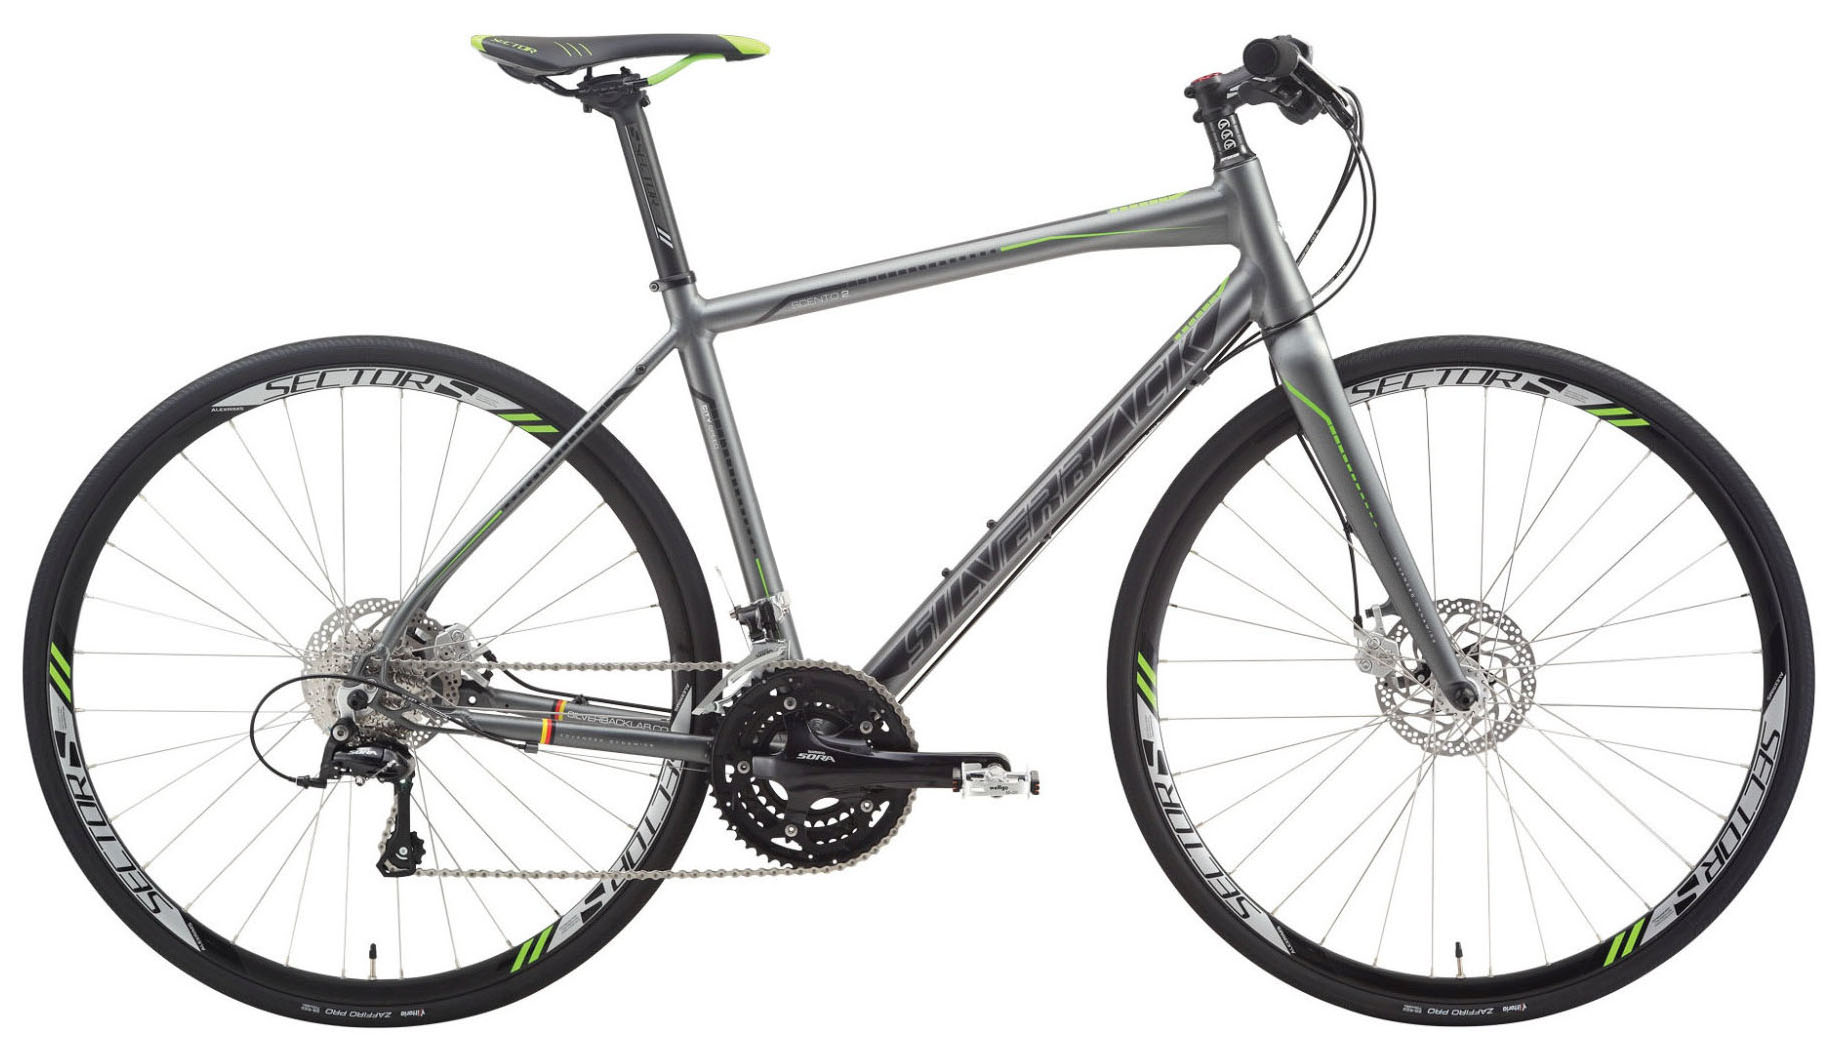 Велосипед Silverback Scento 2 2015 велосипед strida 5 2 2015